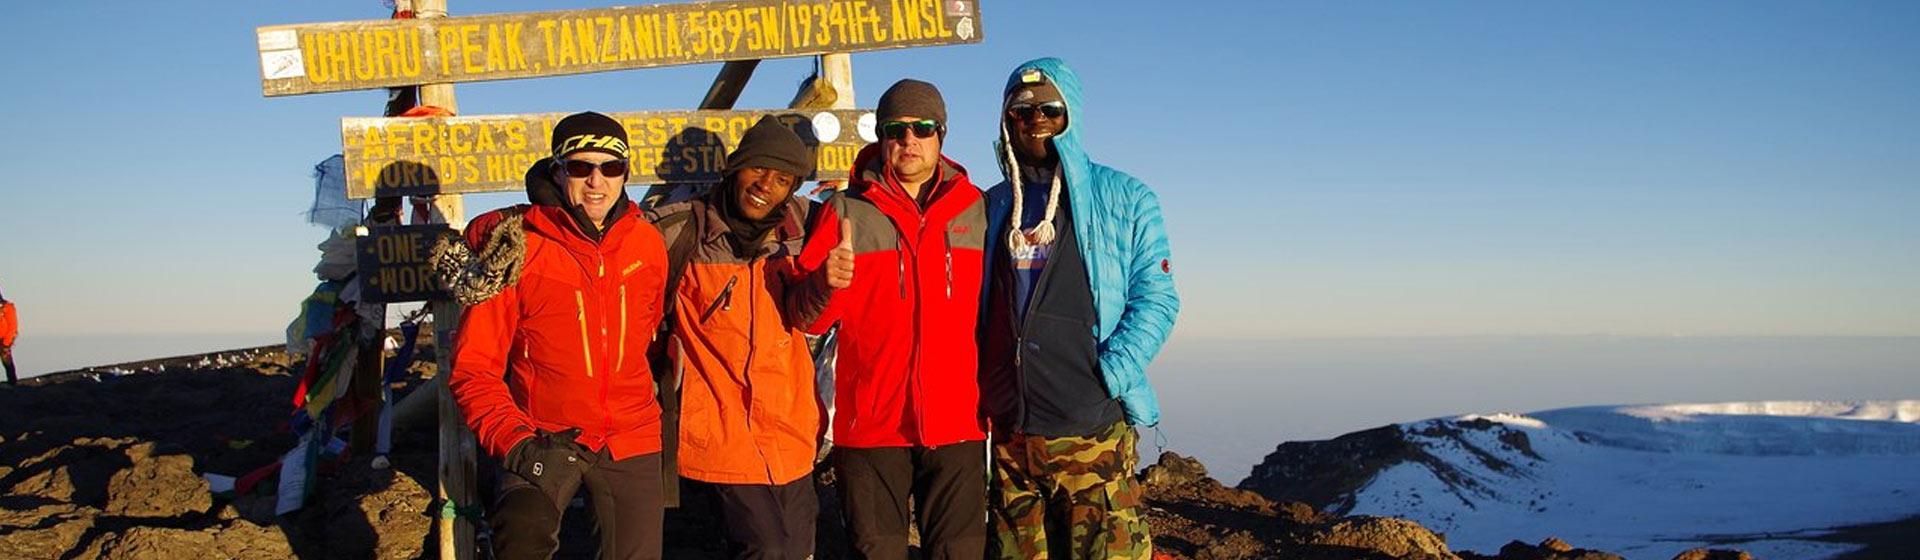 Kilimanjaro Group Climbs